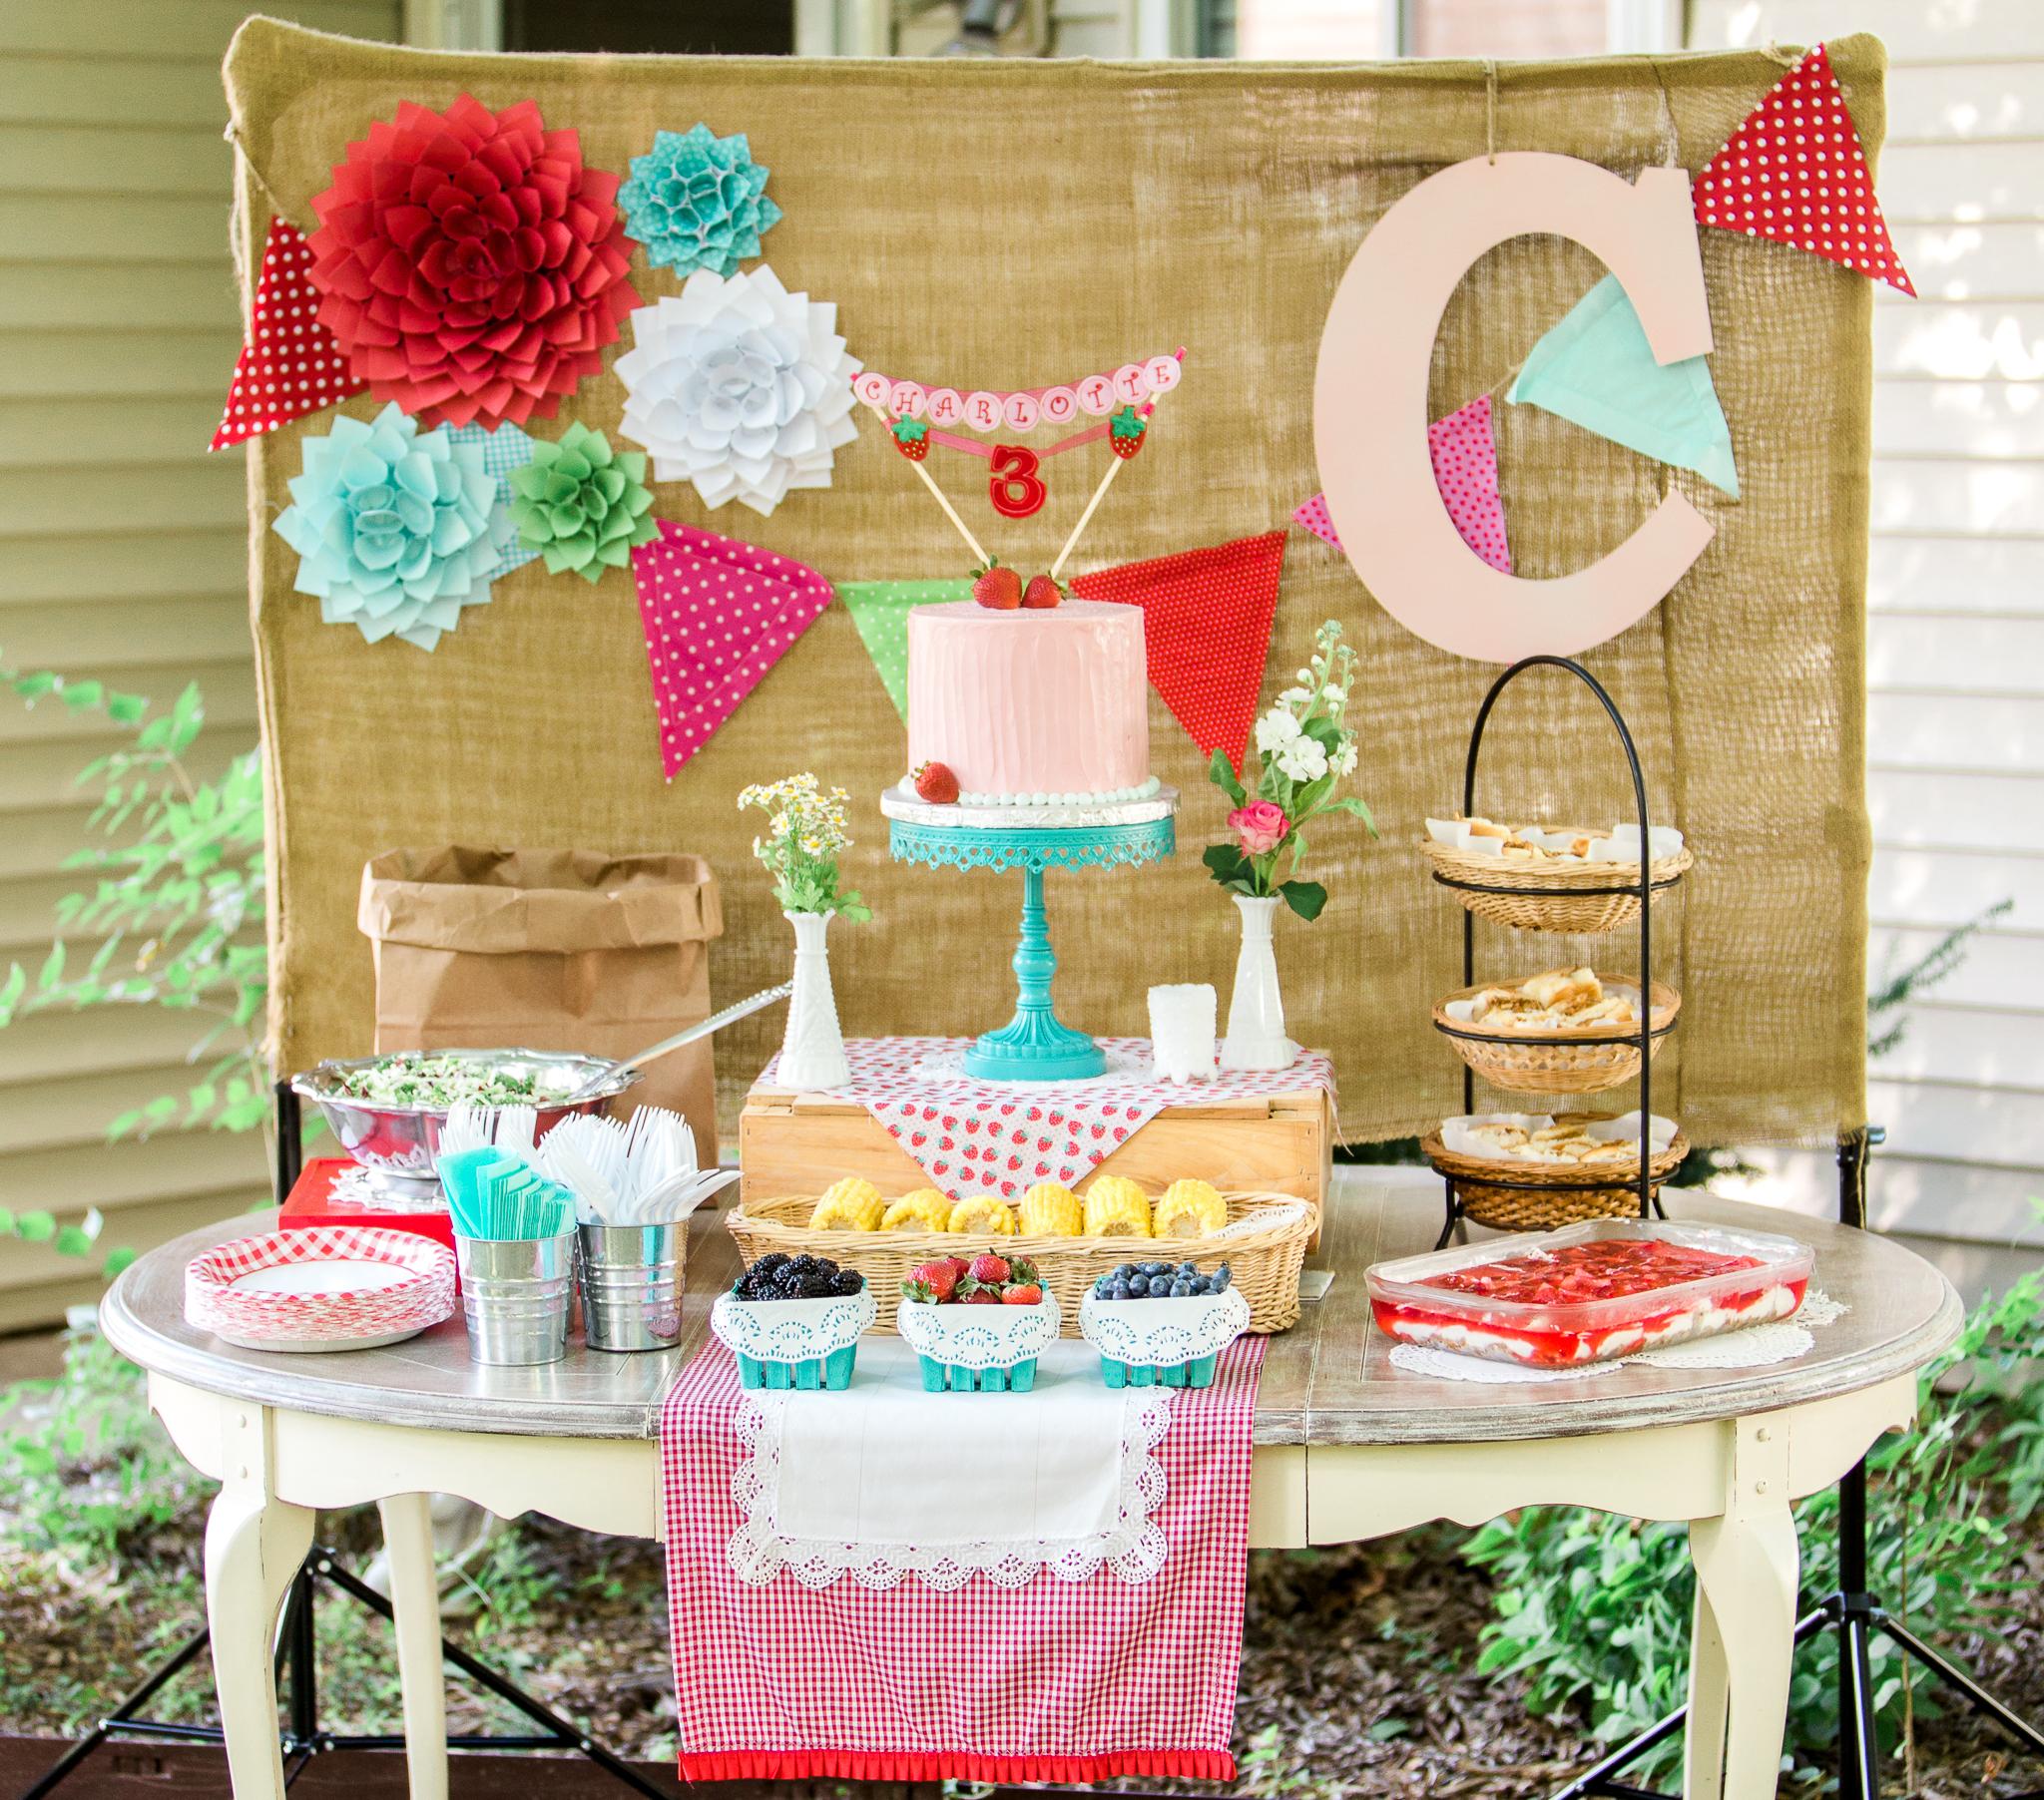 Charlotte's Backyard Strawberry Picnic Party - Project Nursery